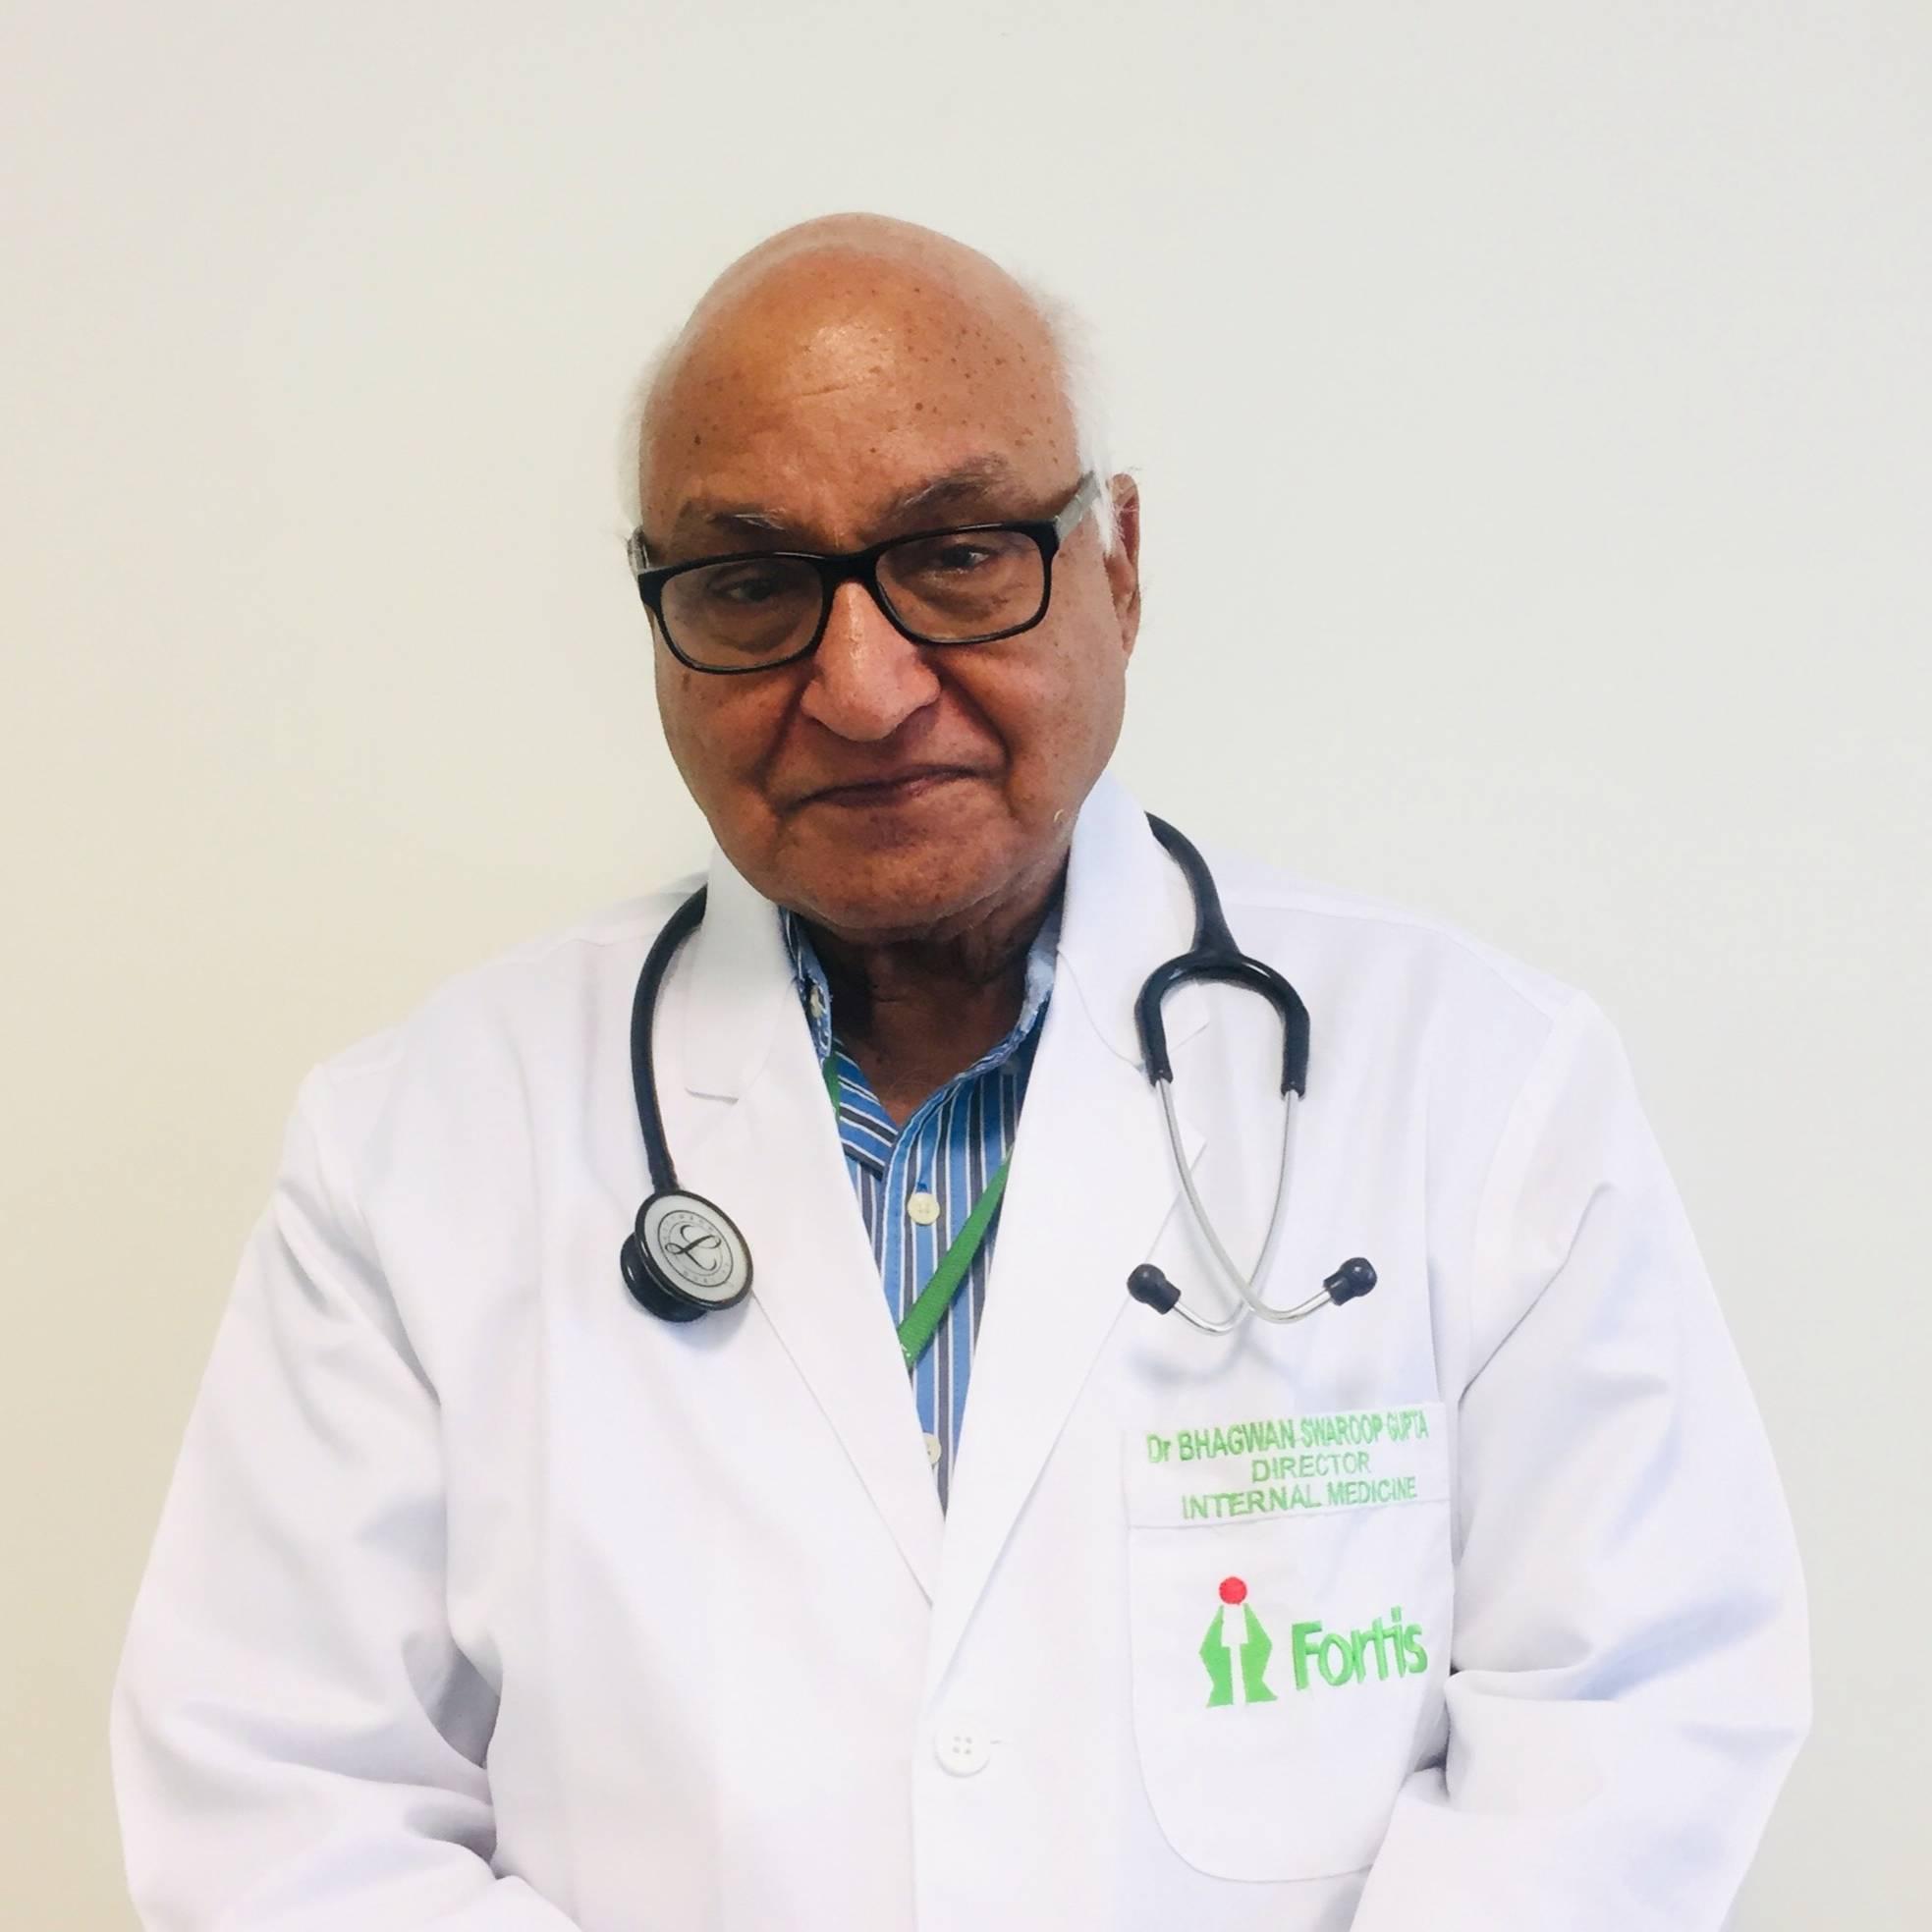 Dr. Bhagwan Swaroop Gupta